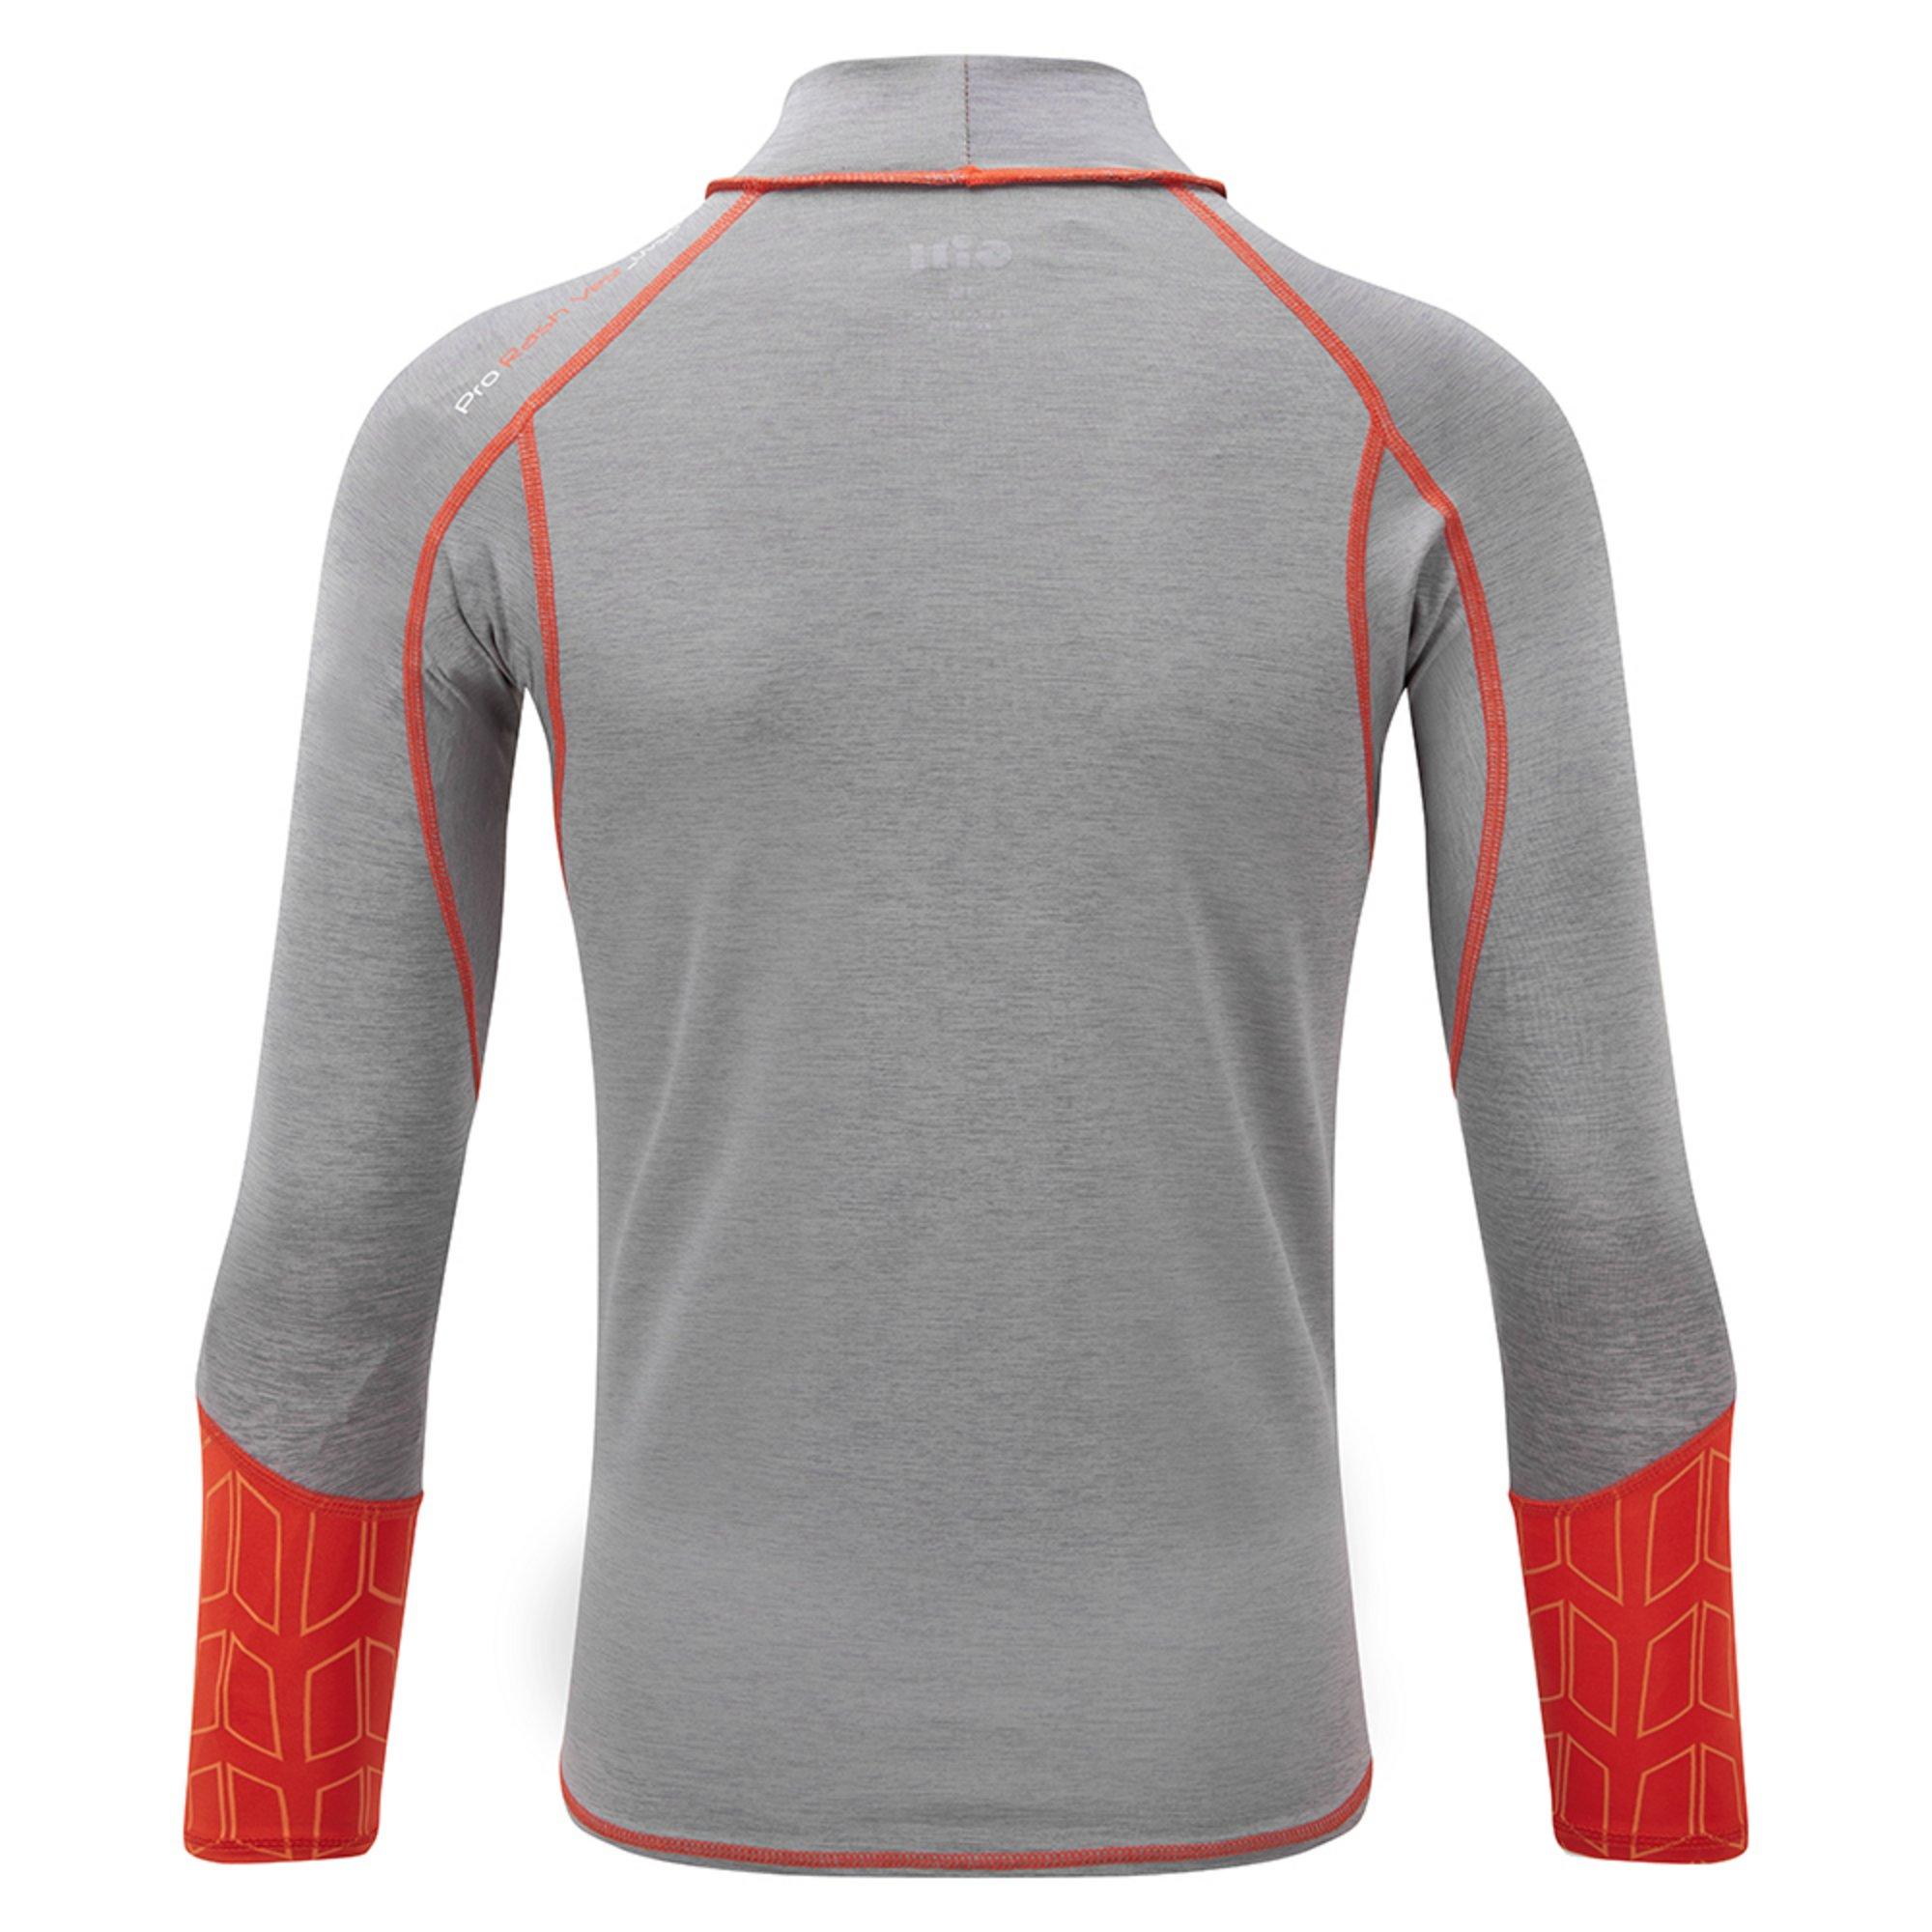 Junior Eco Pro Rash Vest Long Sleeve - 5025J-GRE18_2.jpg